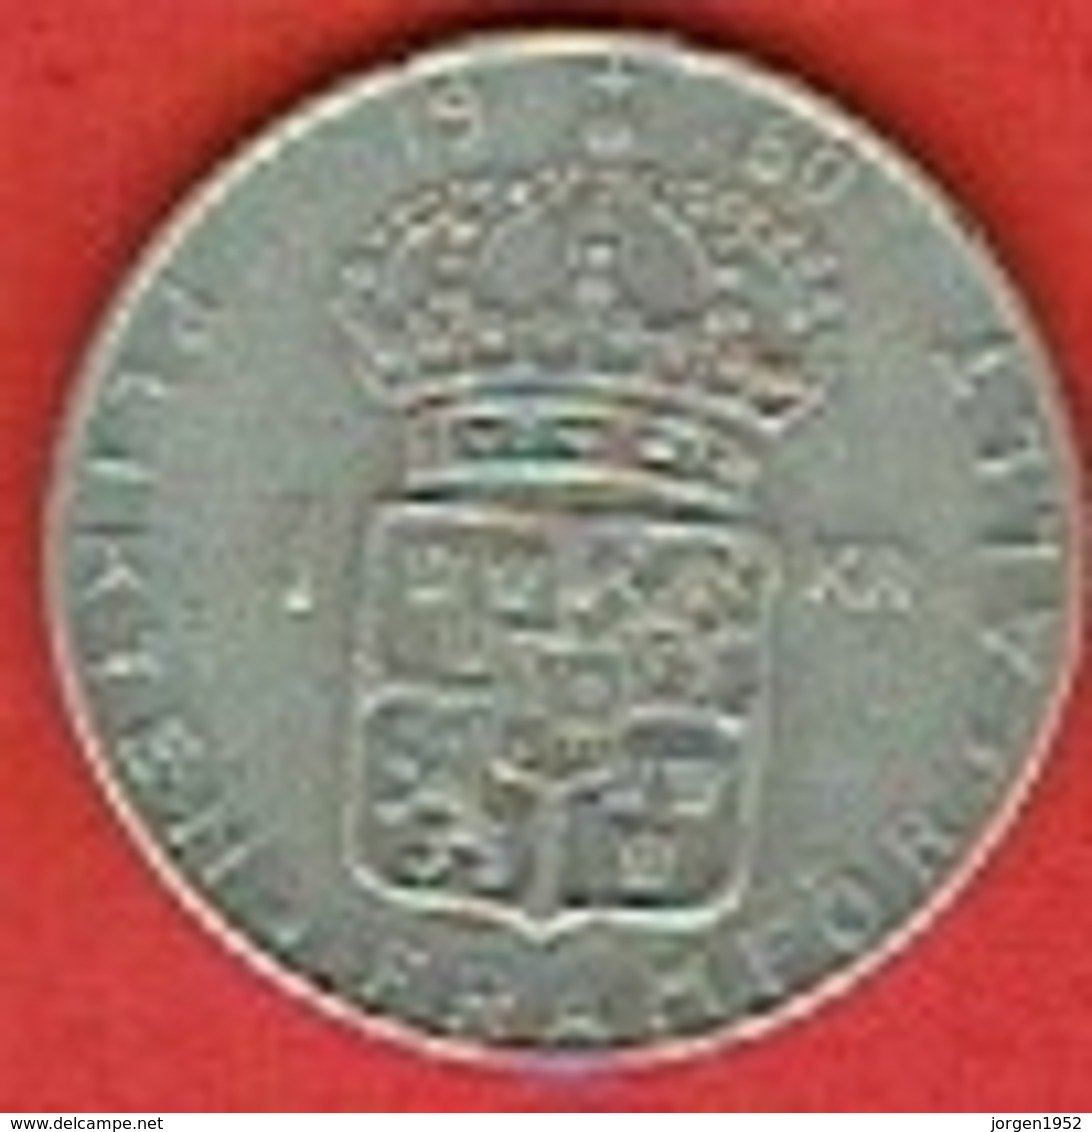 SWEDEN #  1 KRONE FROM 1960 - Suède